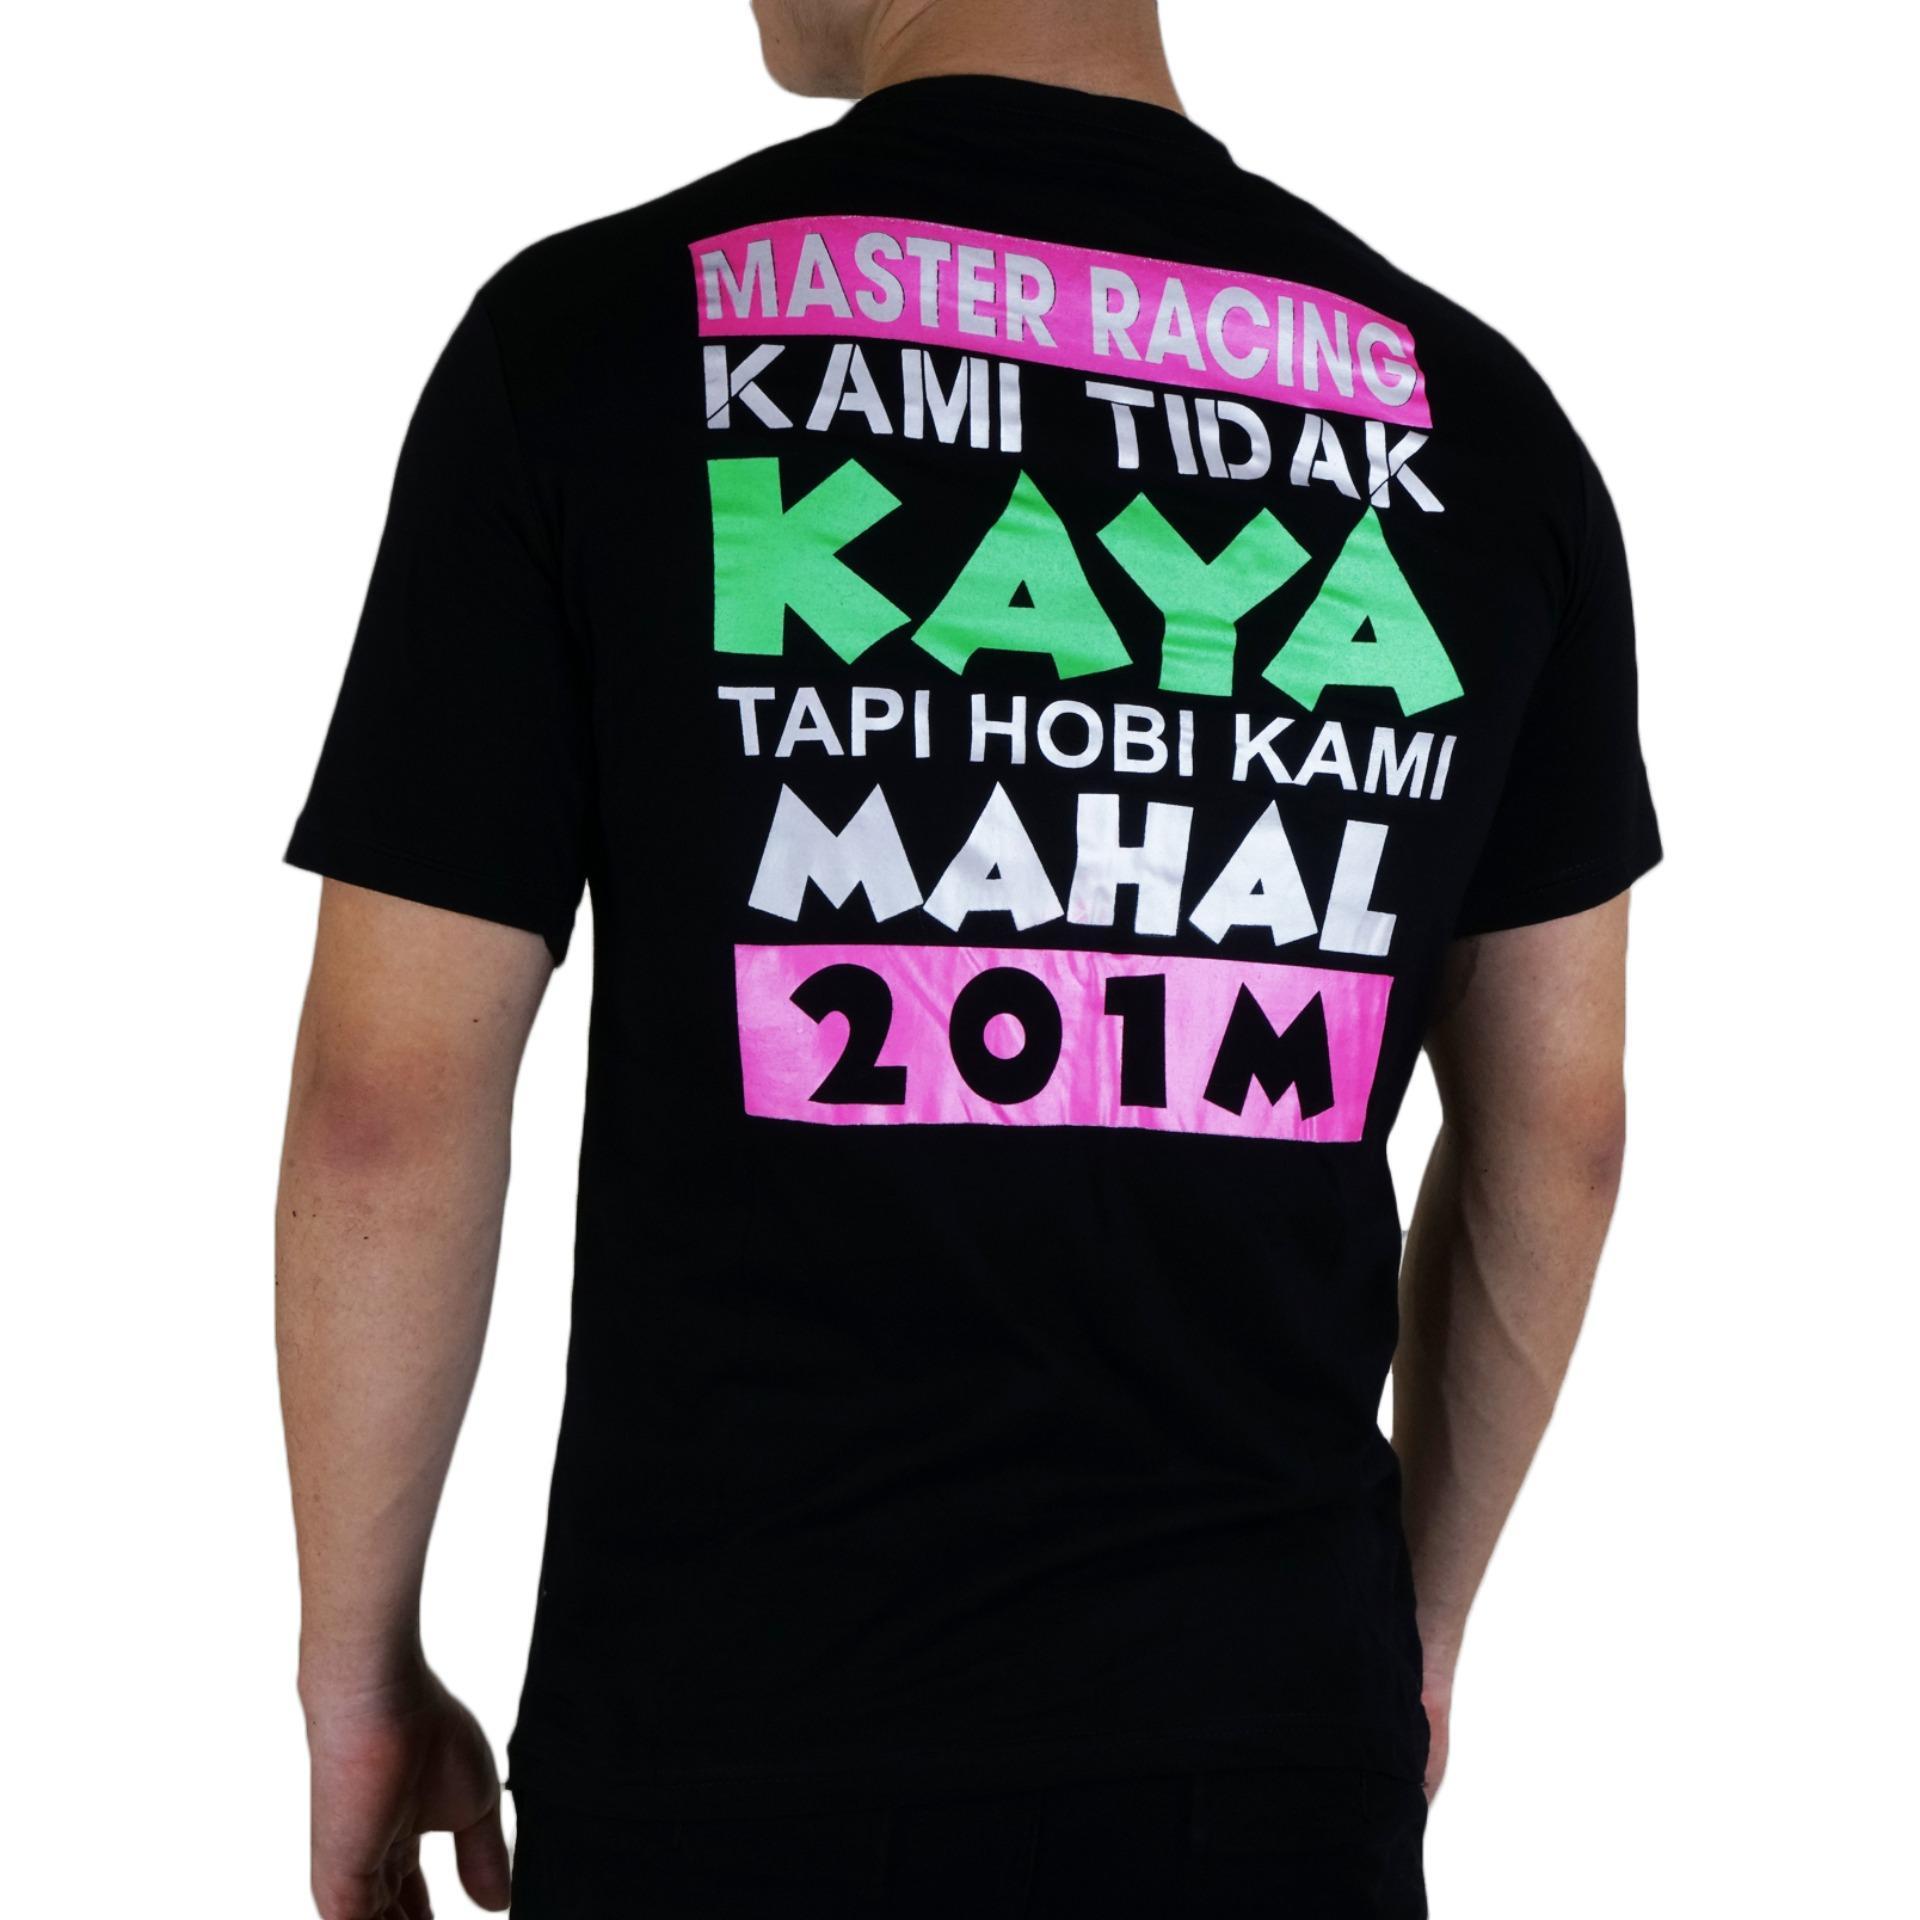 Detail Gambar Vanwin Kaos T Shirt Distro kaos Pria Tshirt Pria Distro Pria Baju Pria Premium Racing Cartoon Gaspoll Hitam Terbaru